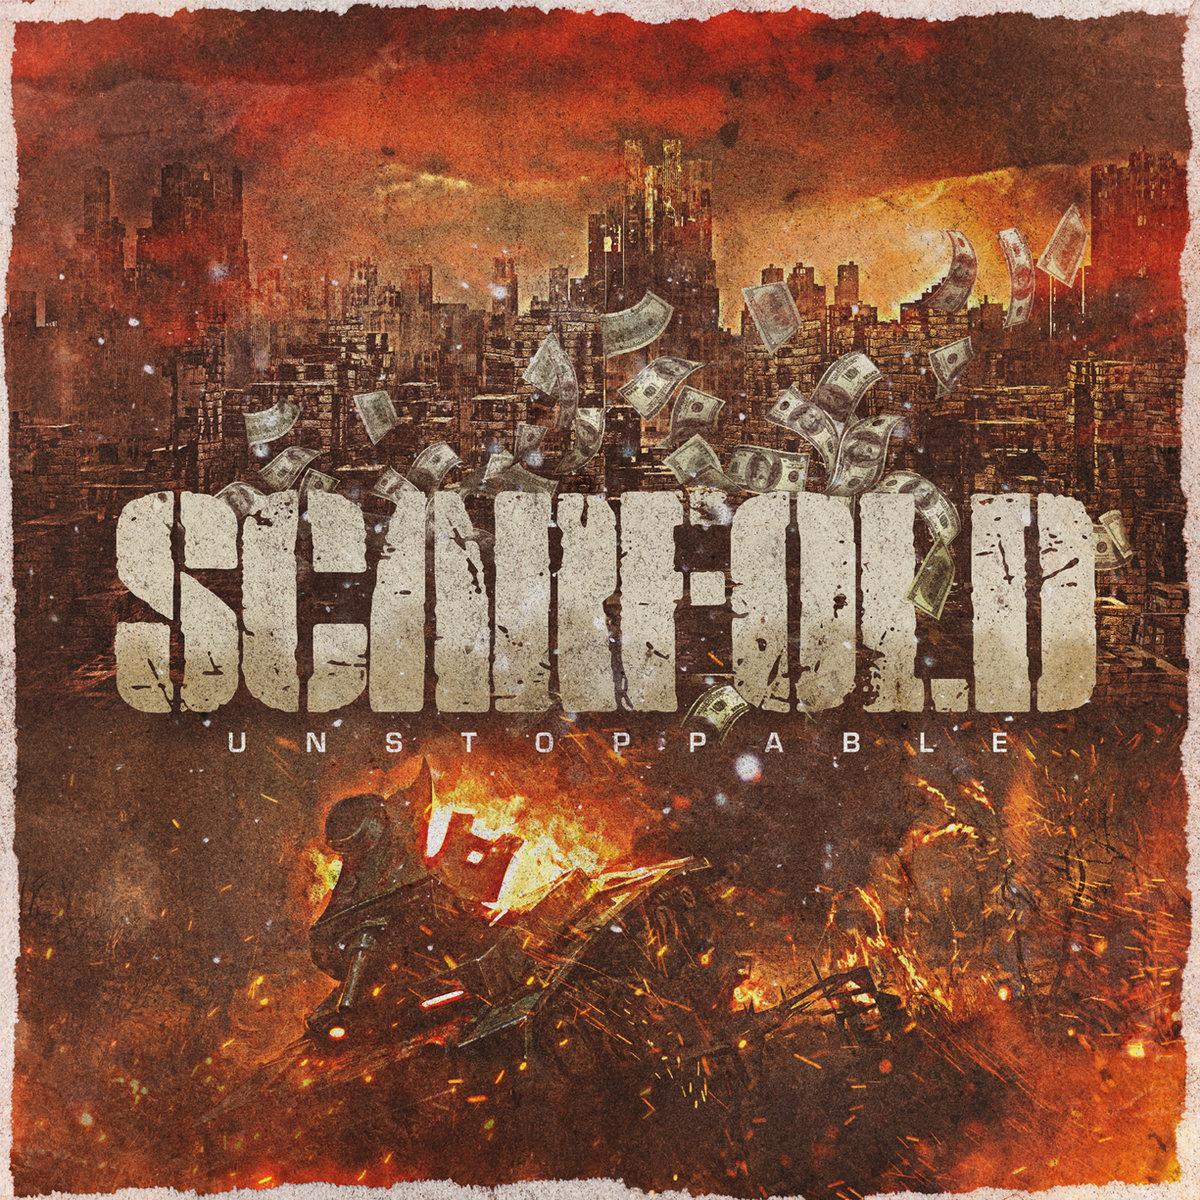 Scarfold - Unstoppable